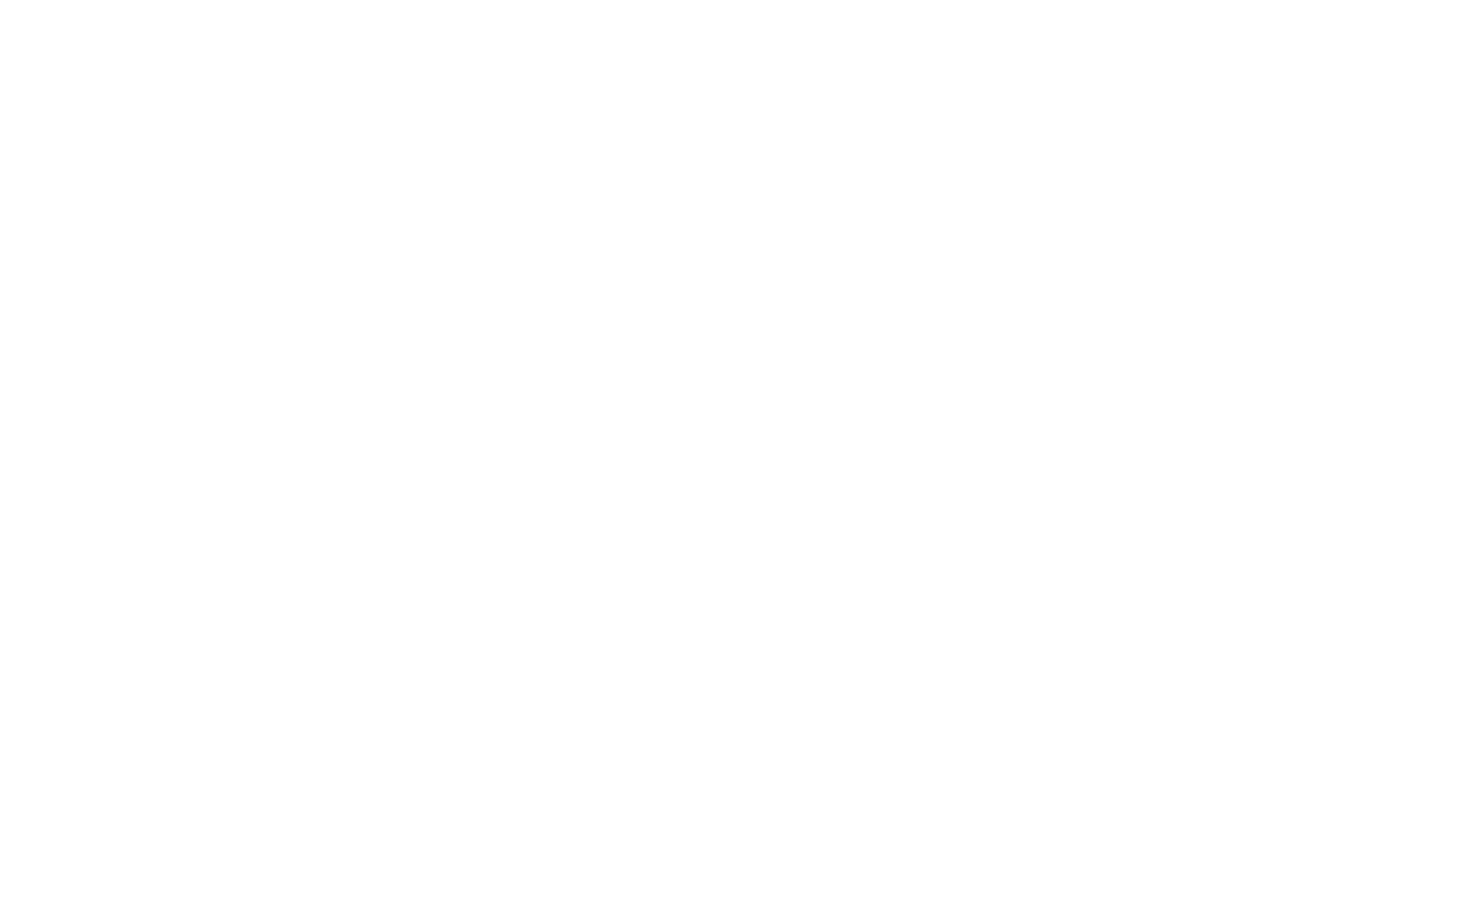 Sunshine Home Tour